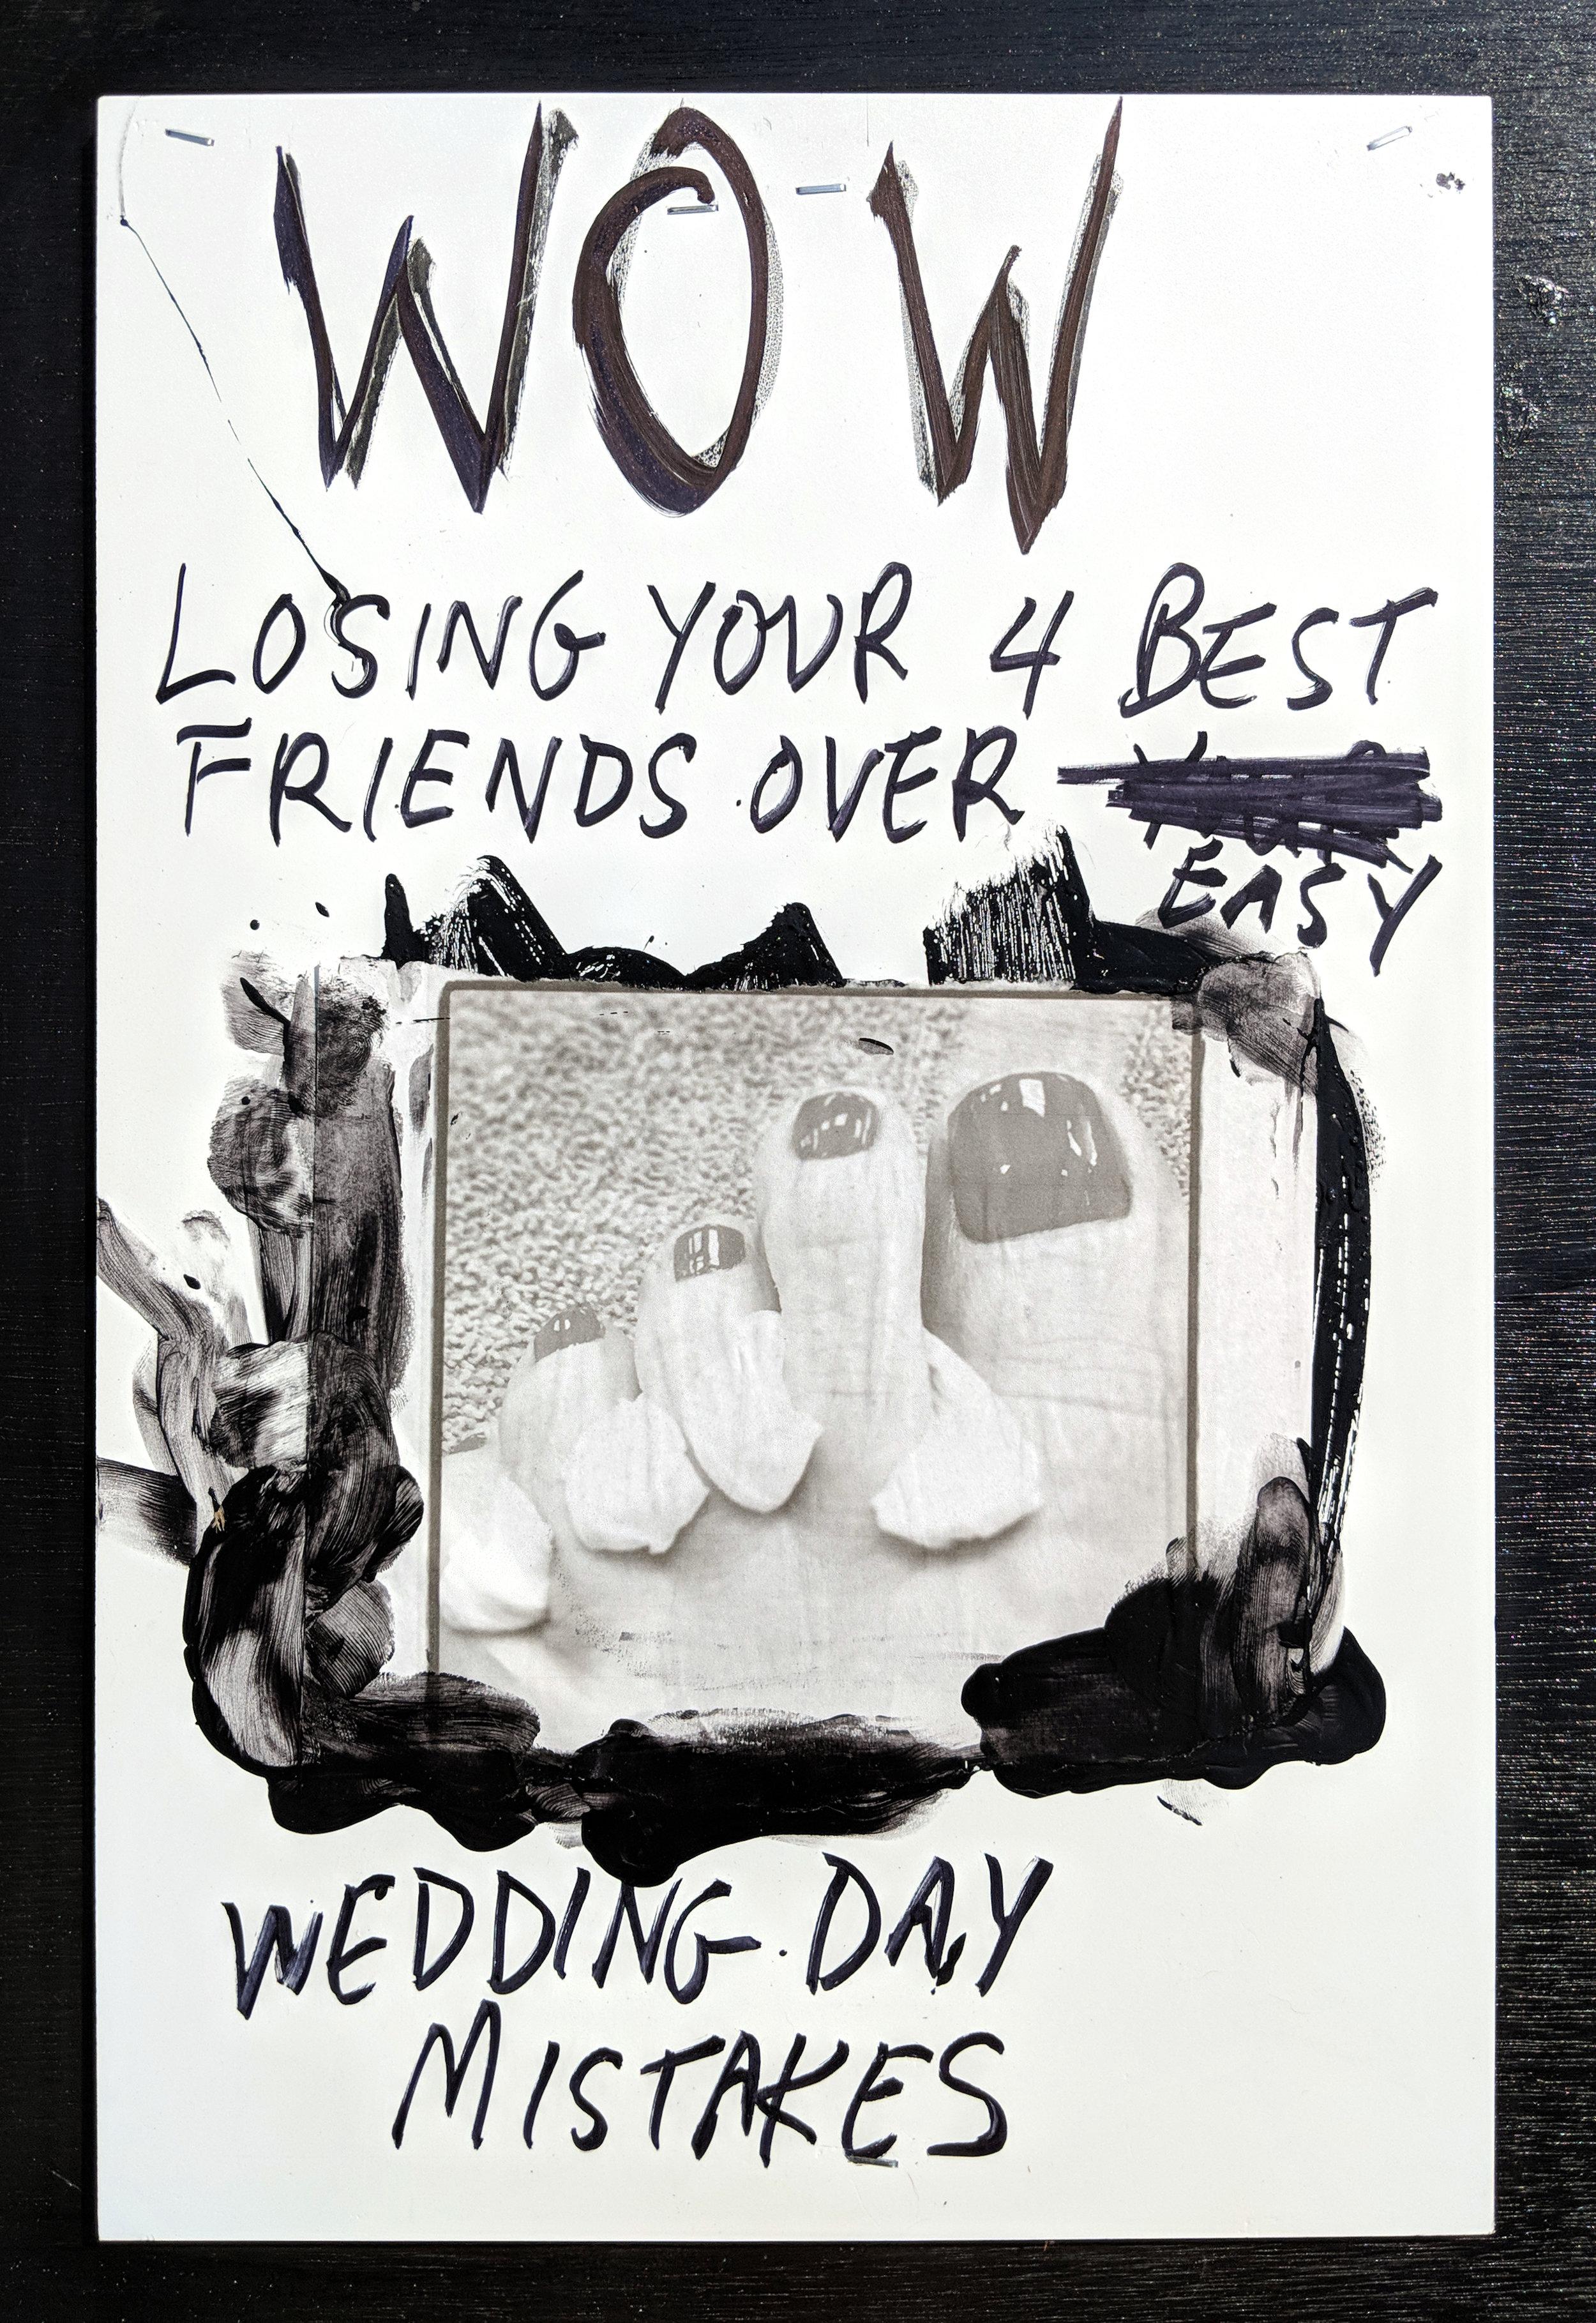 Wedding Day Mistakes.jpg